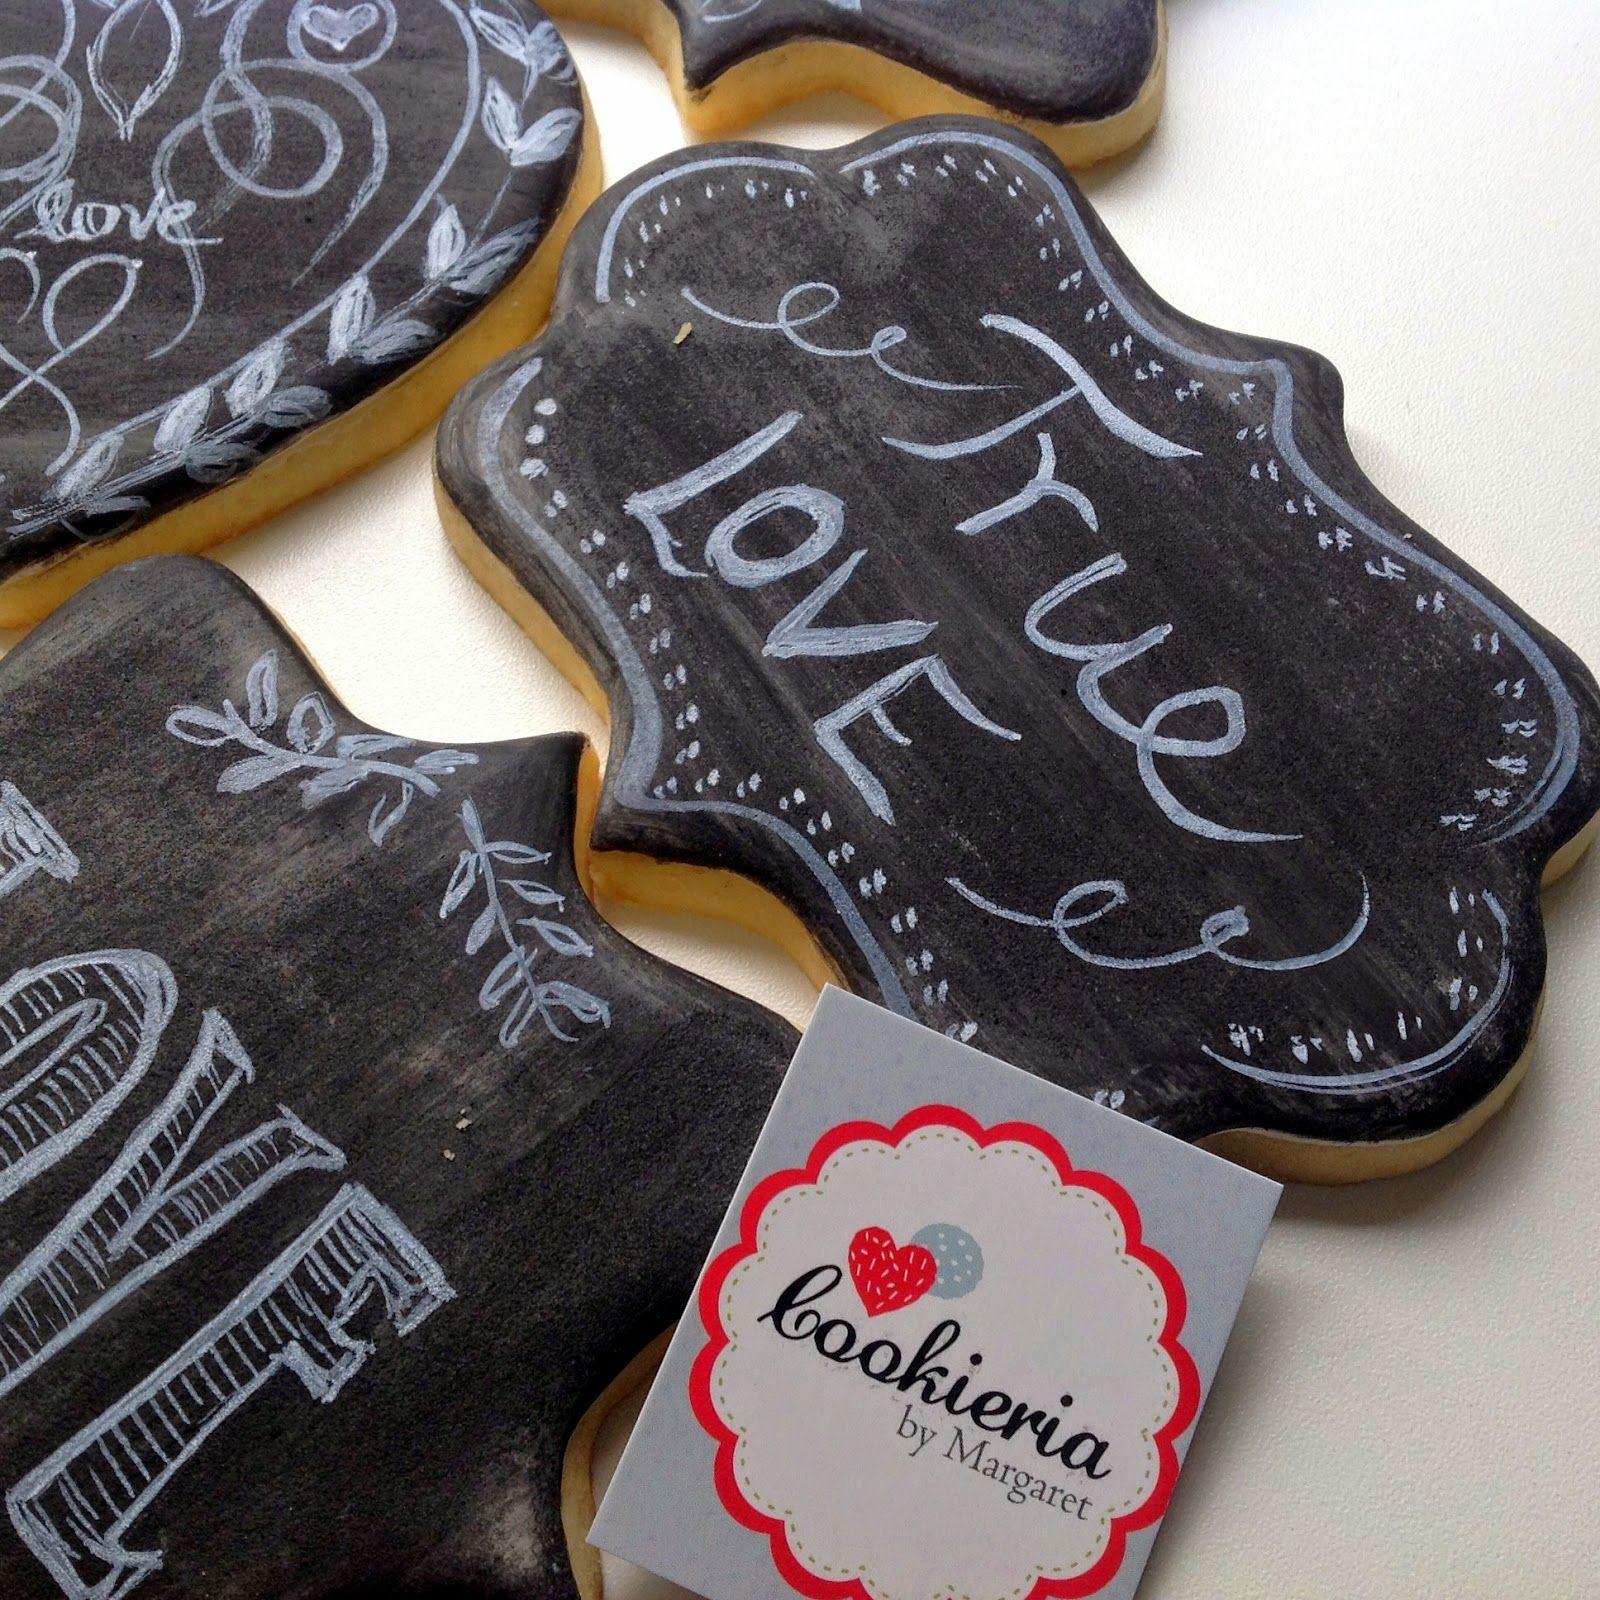 Cookieria By Margaret: Cookies Në Style dërrasë ose whiteboard ...